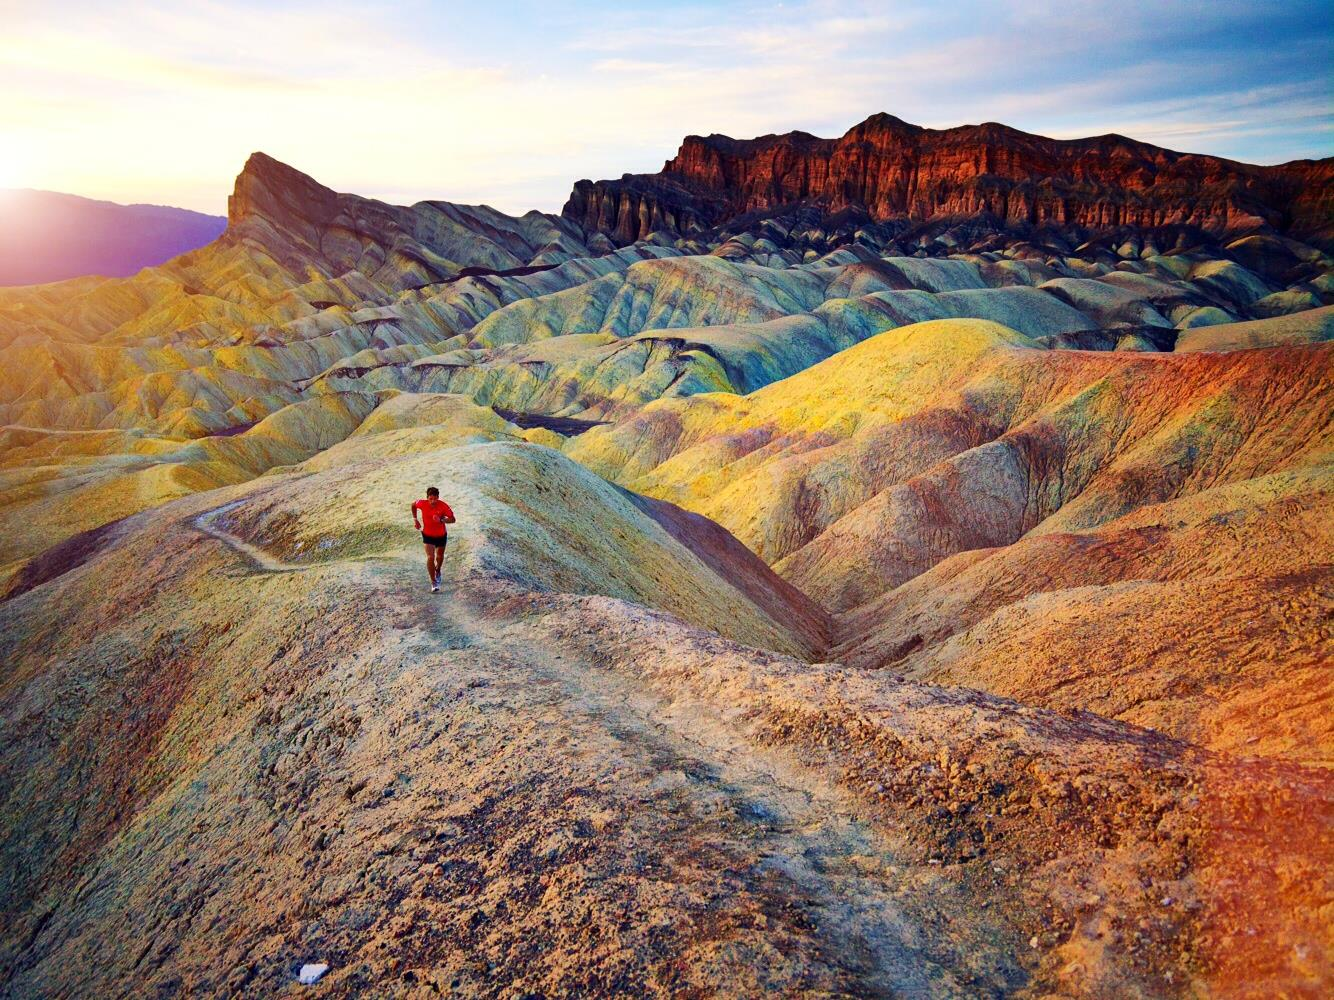 Dean Karnazes trains ahead of his Silk Road Sports Envoy run through Uzbekistan, Kyrgyzstan, and Kazakhstan in 2016.